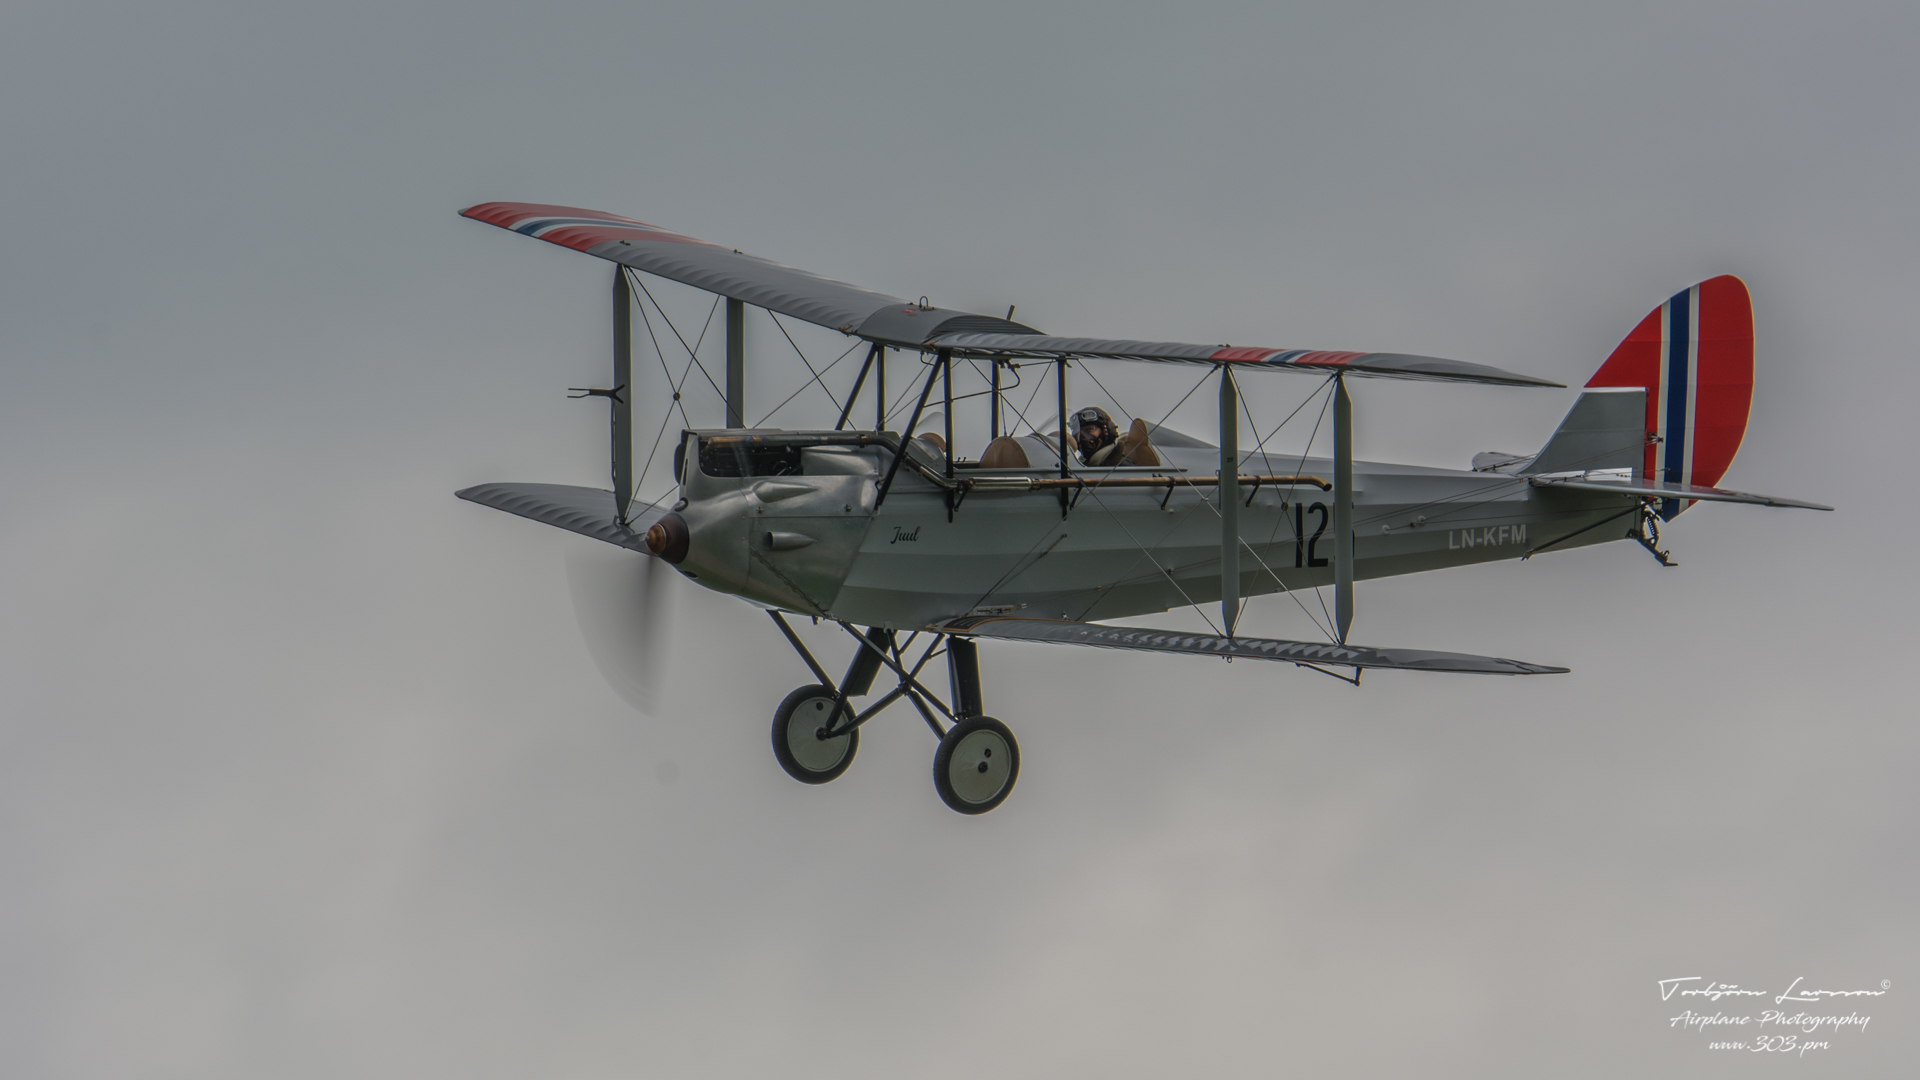 De-Havilland-DH-60M-LN-KFM-TBE_5774